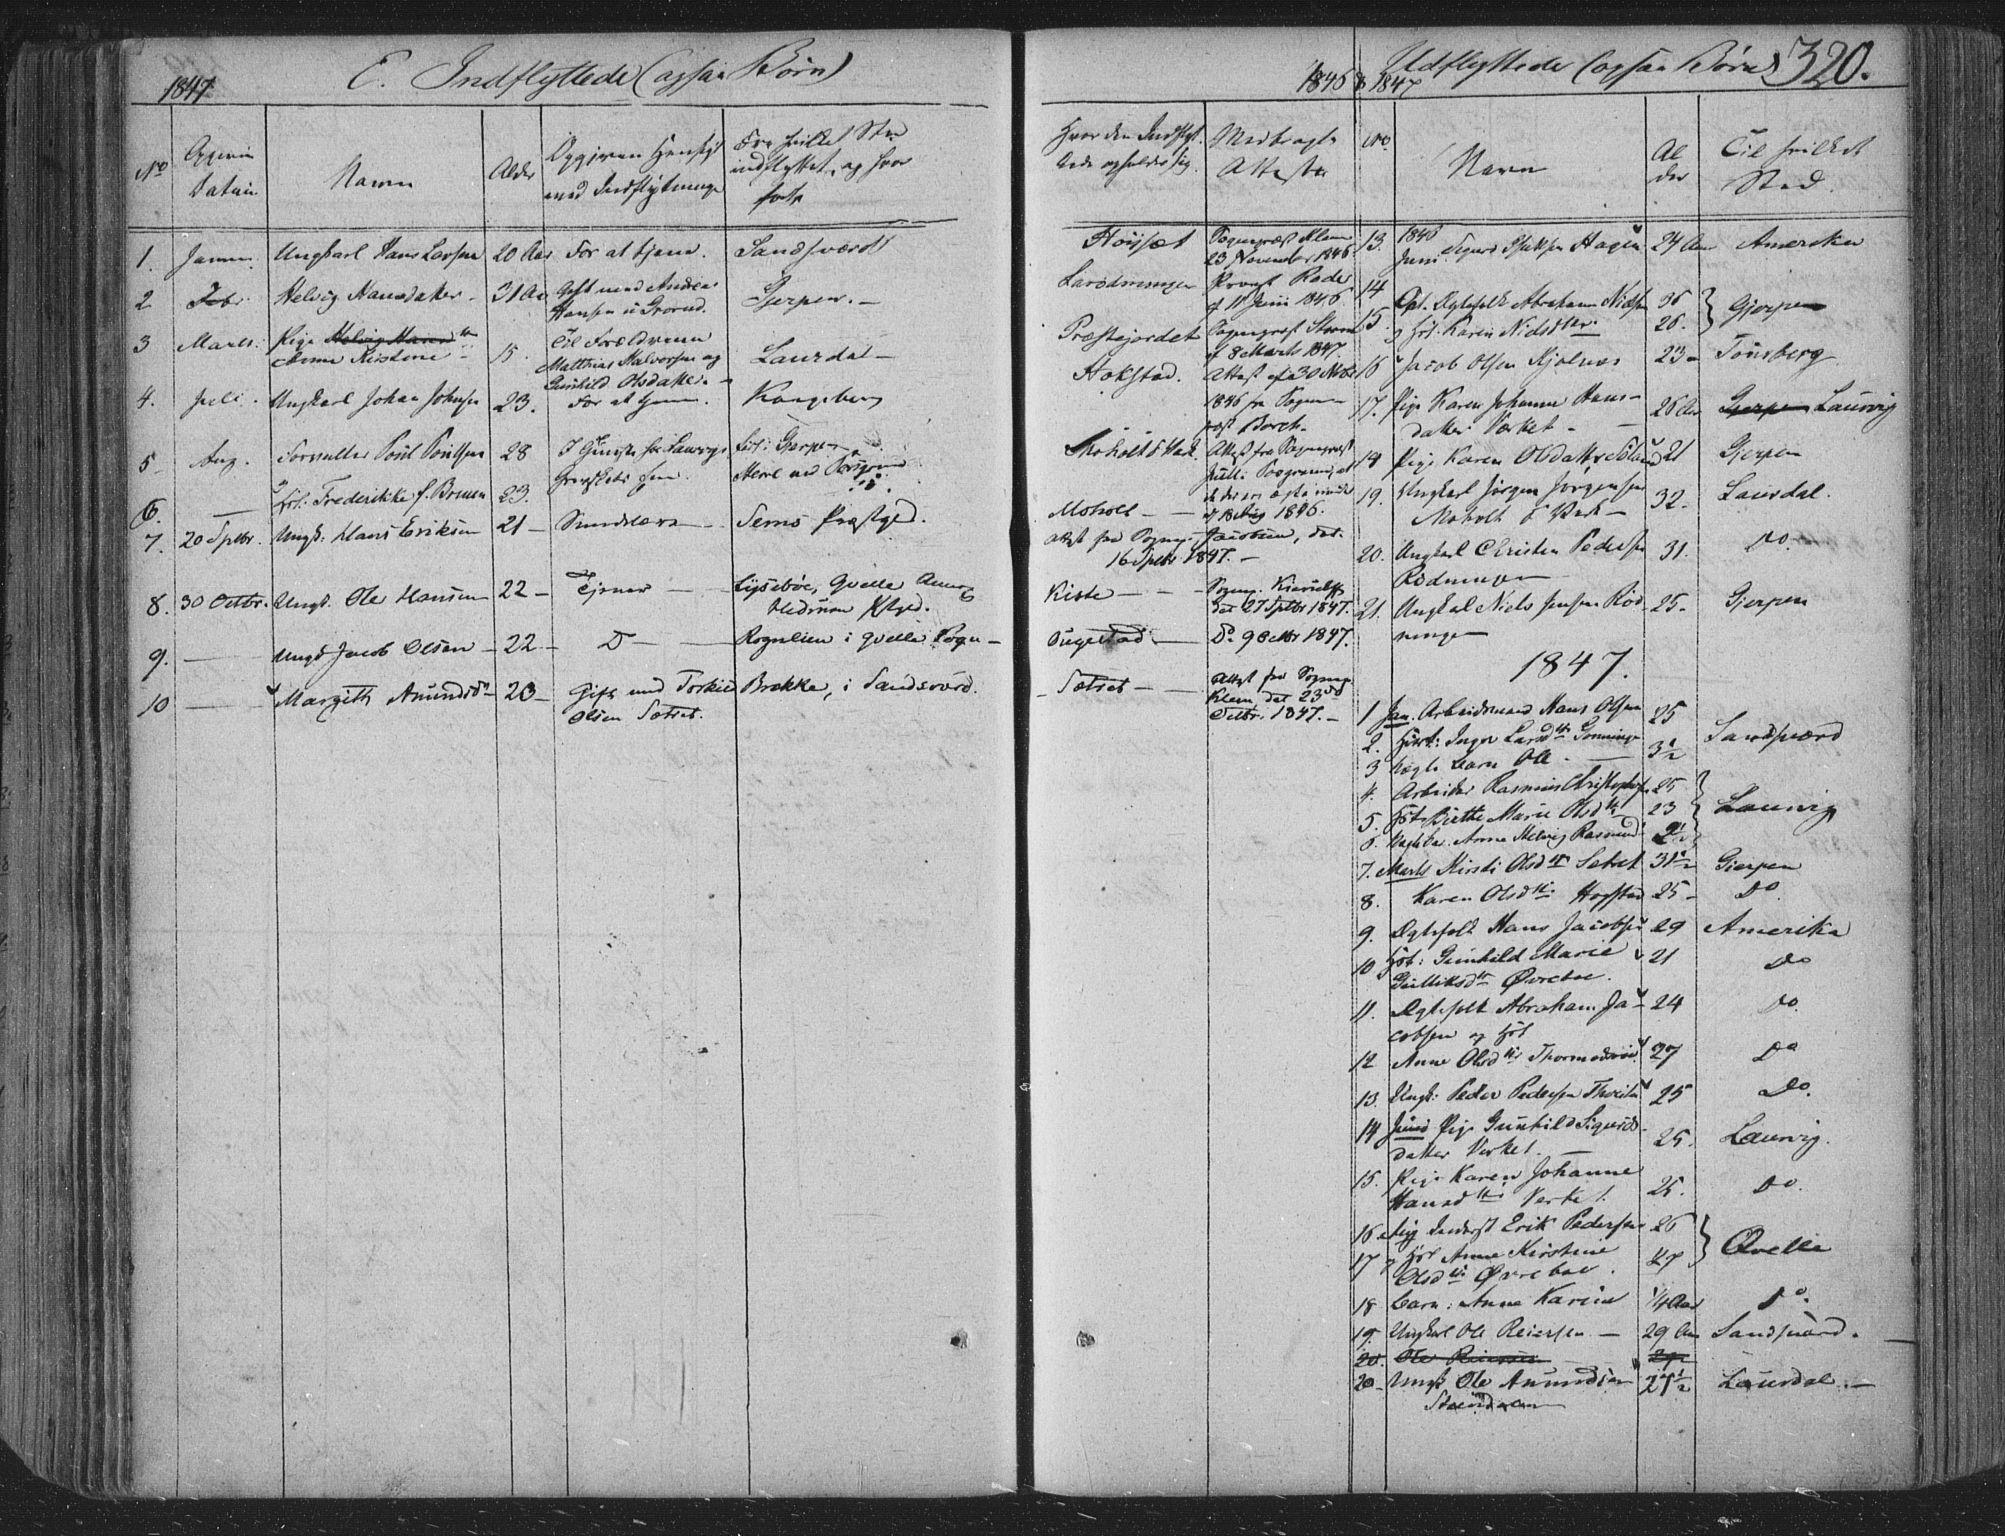 SAKO, Siljan kirkebøker, F/Fa/L0001: Parish register (official) no. 1, 1831-1870, p. 320